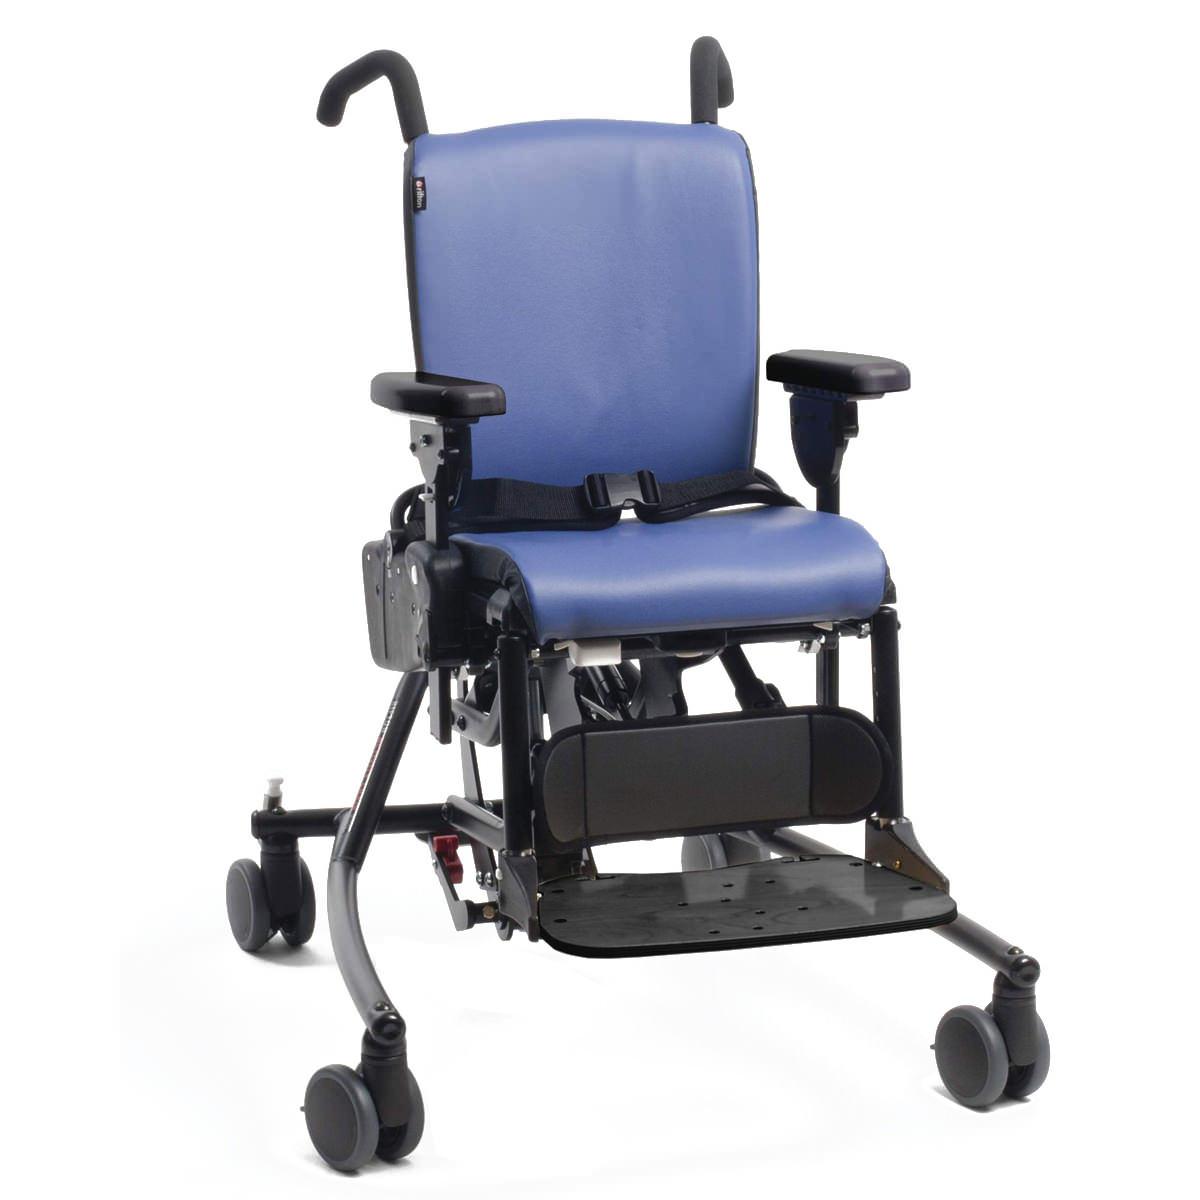 Rifton activity chair with hi-lo base - Medium